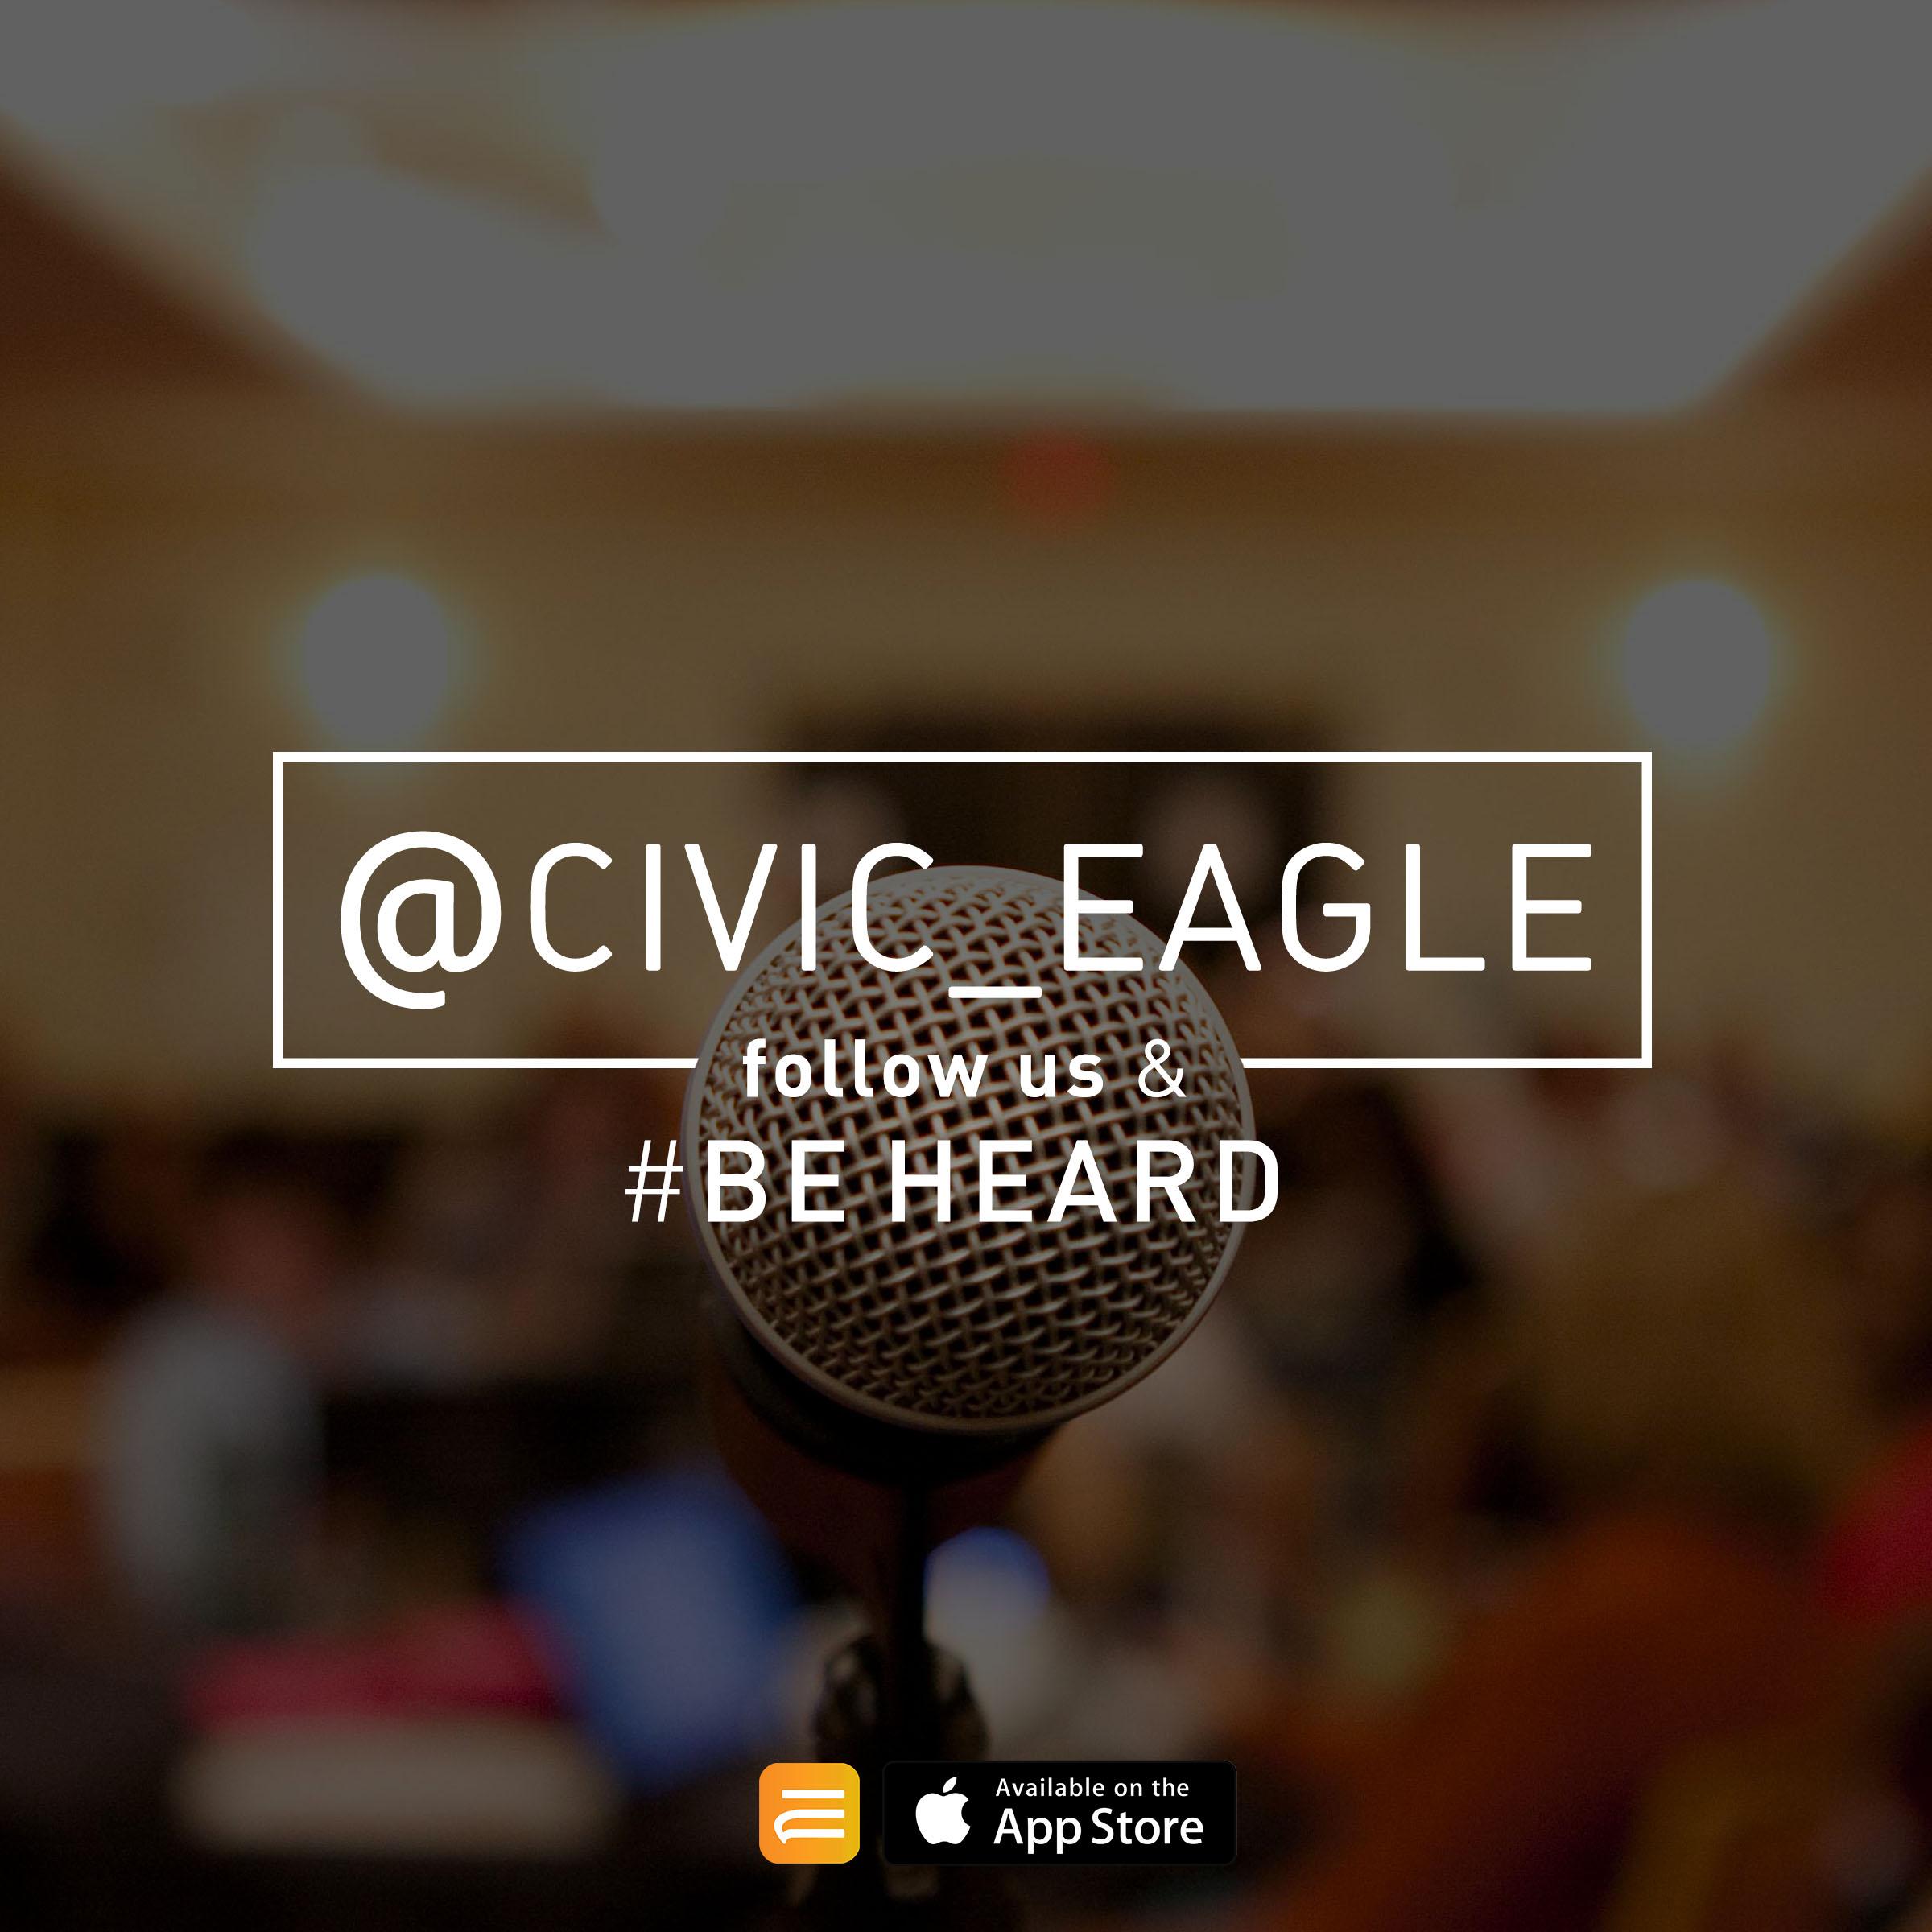 Follow Civic_Eagle2.jpg